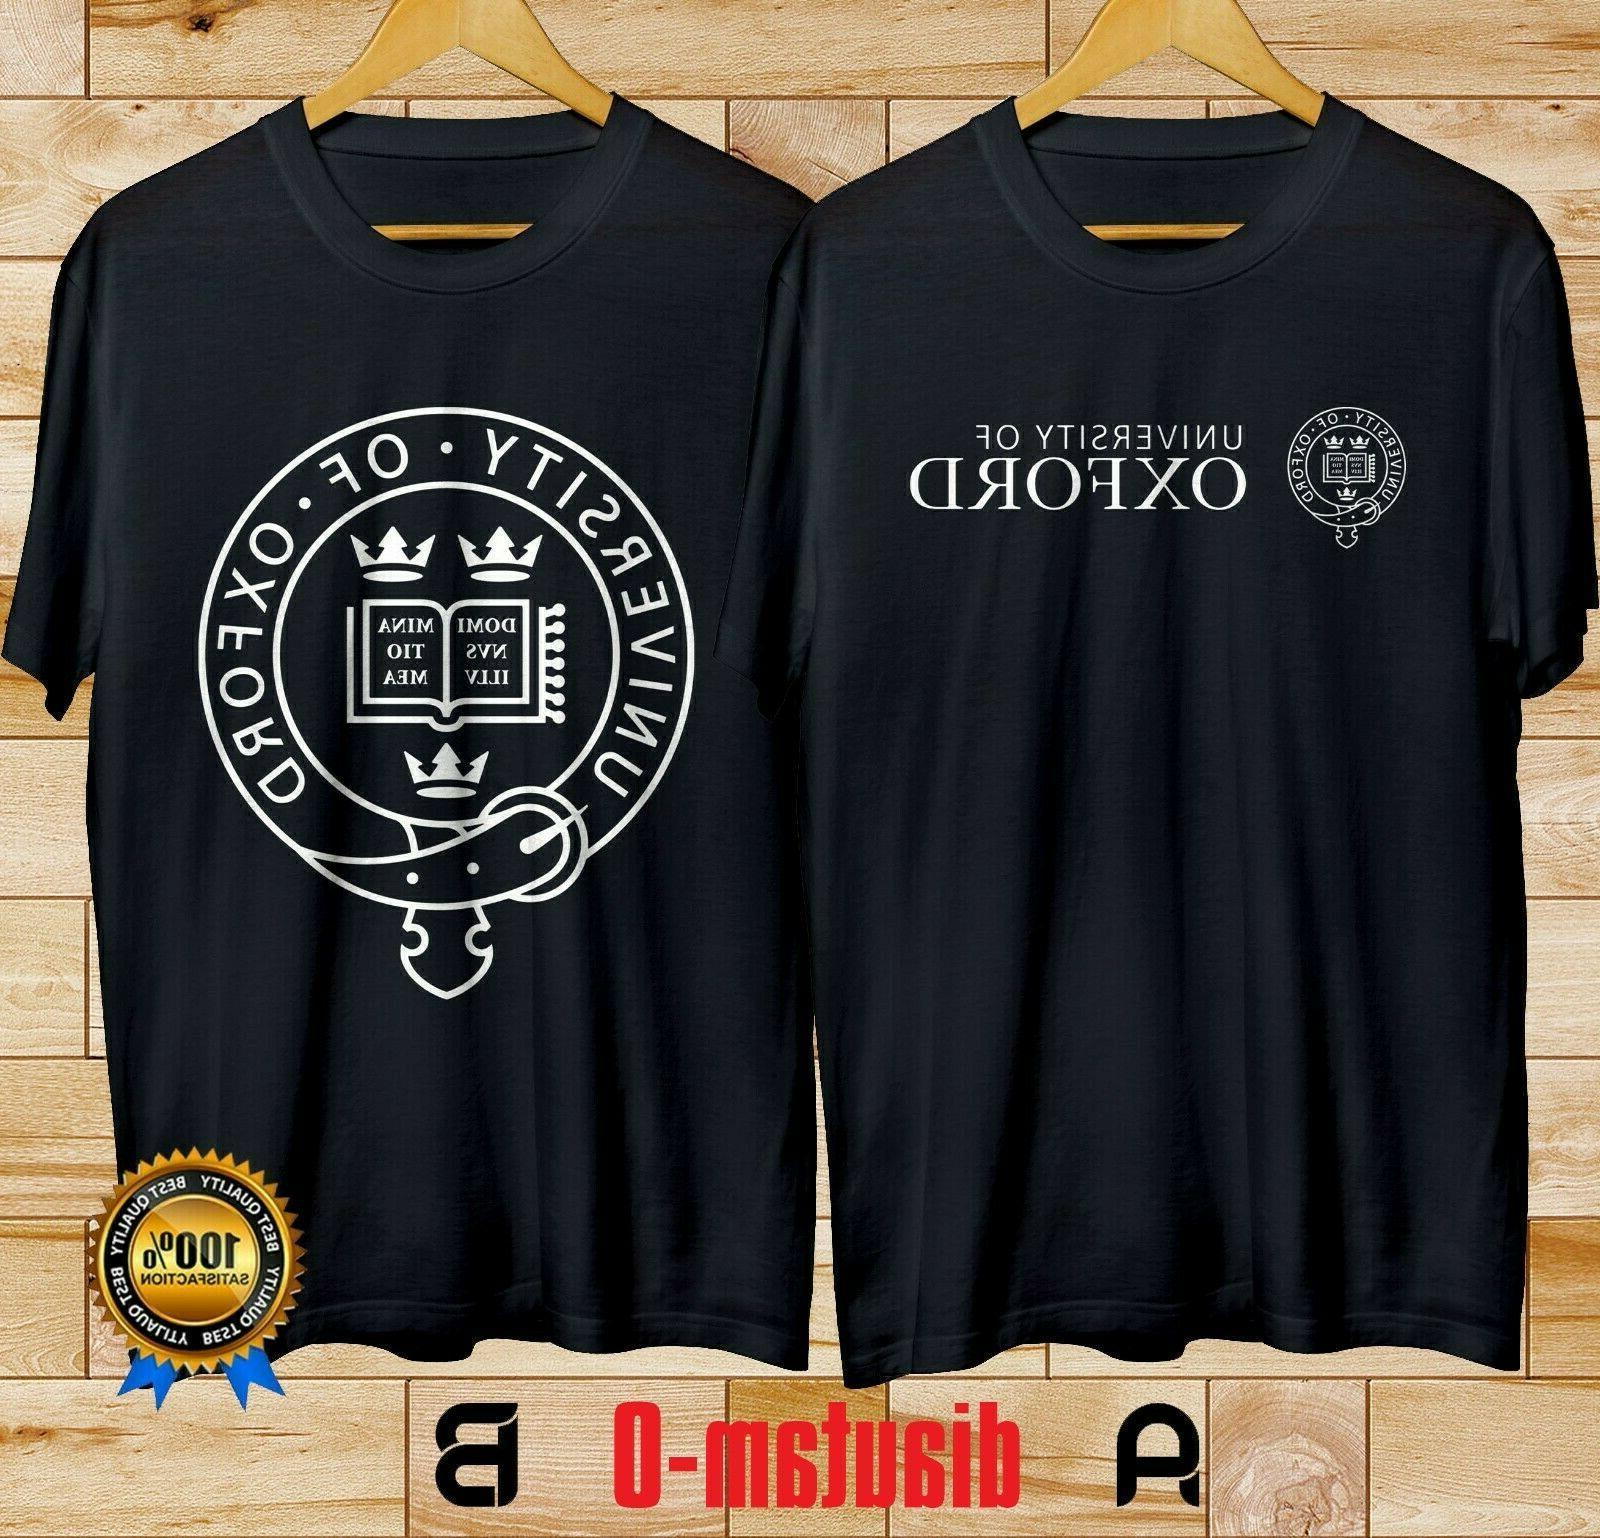 new oxford university england clothing black t